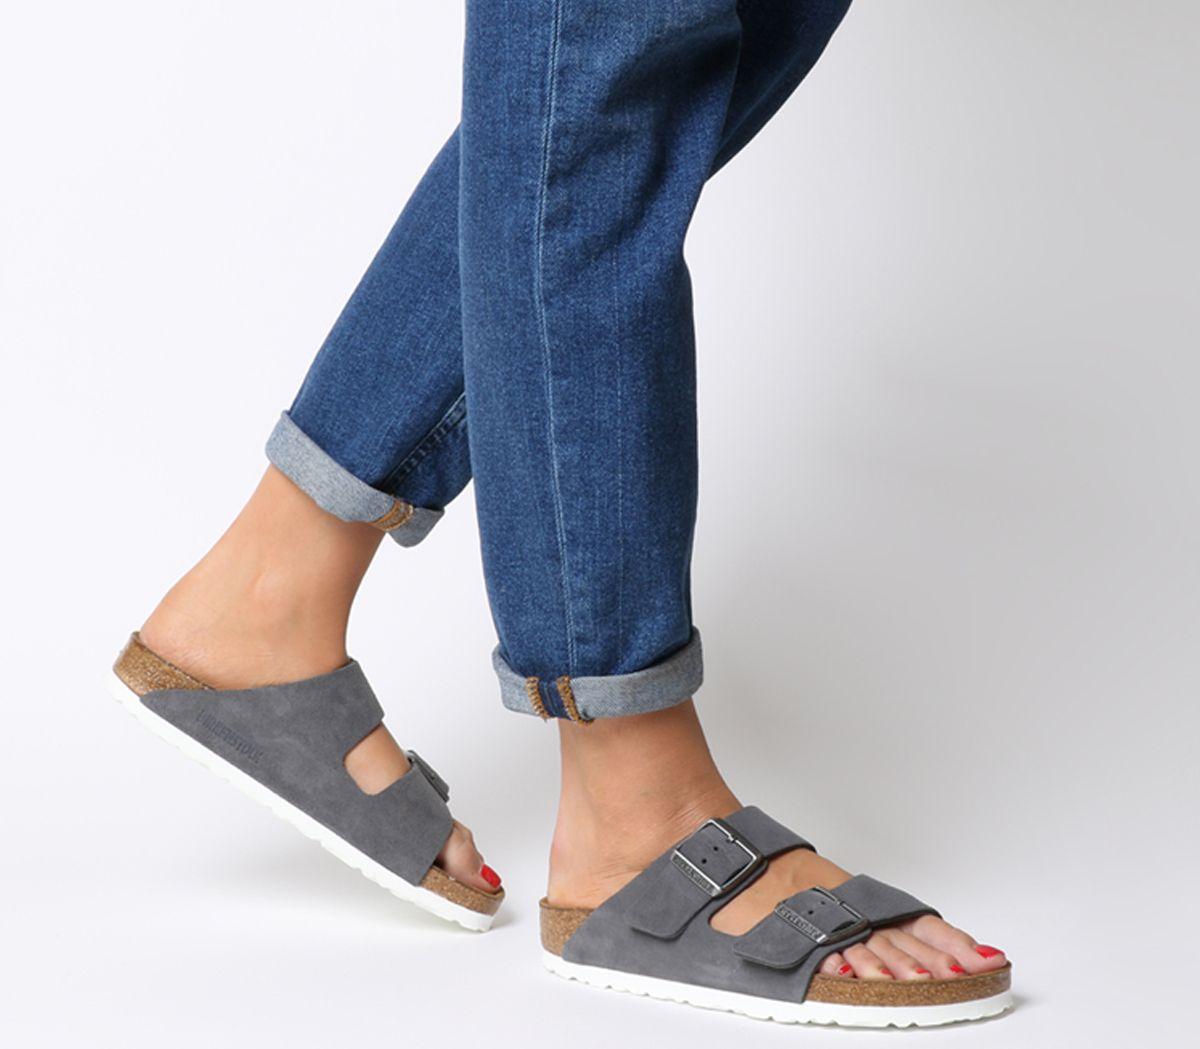 362a58ab1 Birkenstock Arizona Two Strap Sandals Stone Suede - Sandals